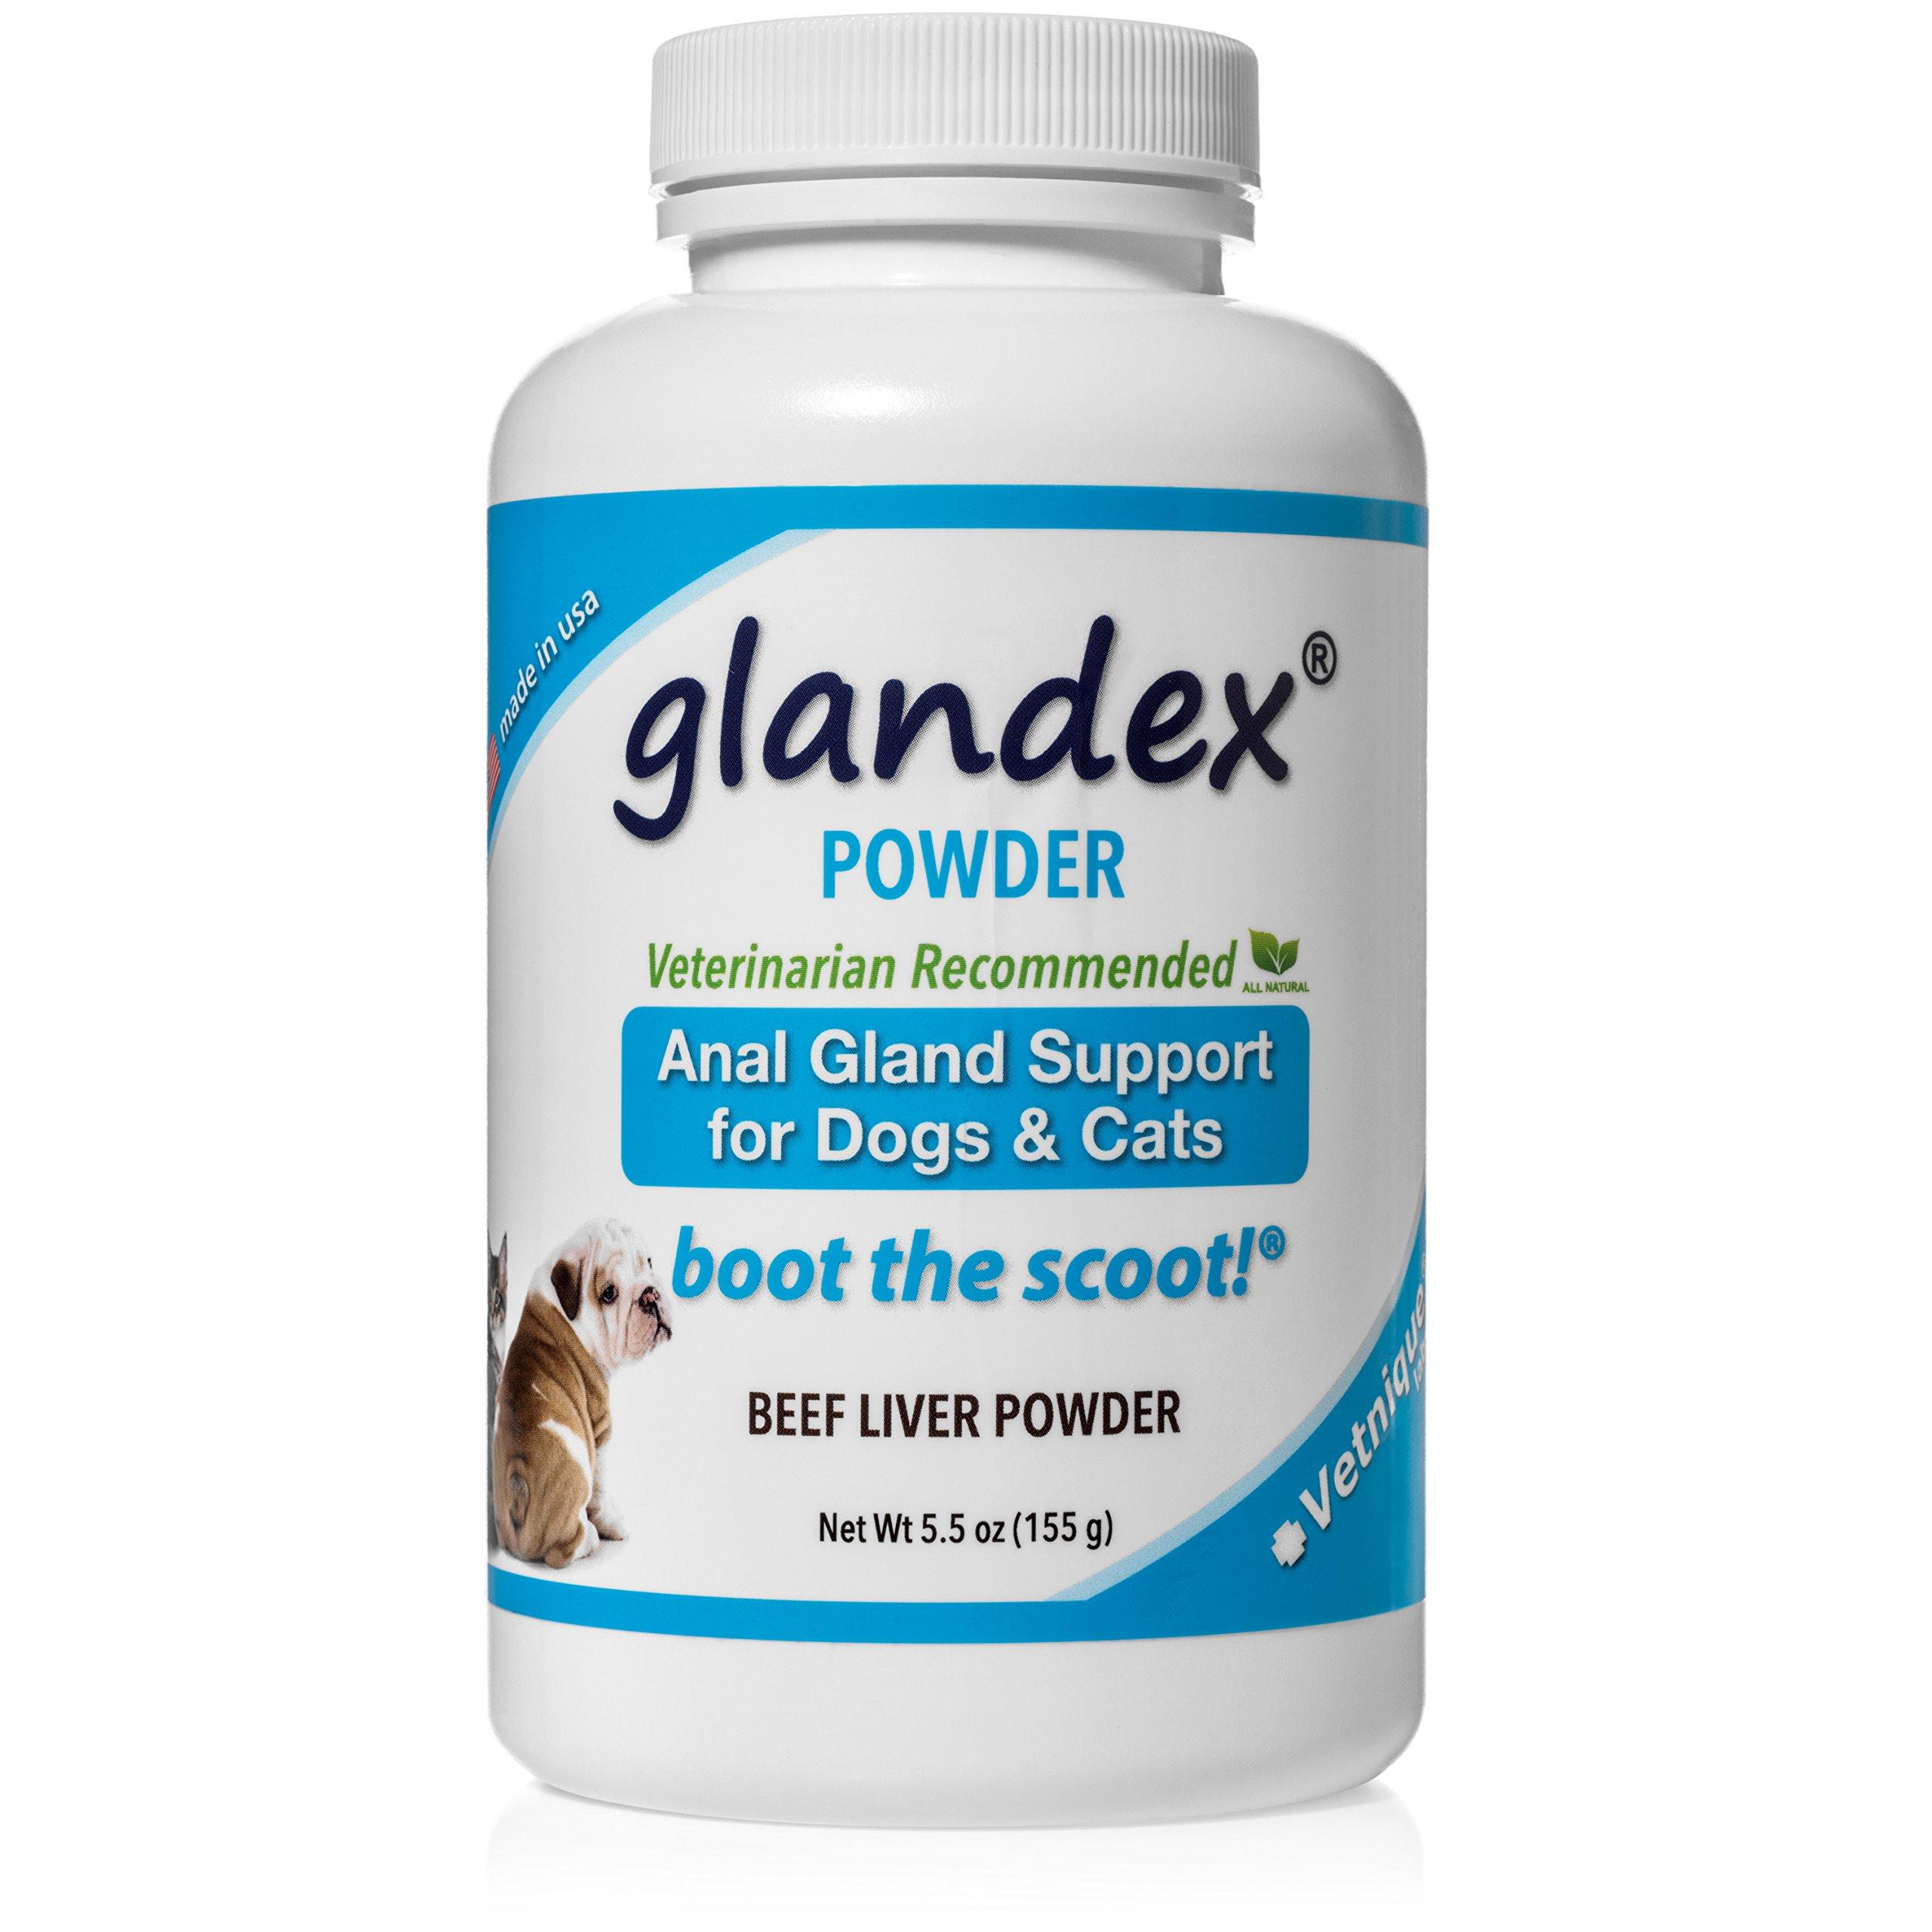 Glandex Powder 5.5 oz, Anal Gland Fiber, Pumpkin & Probiotic Digestive Supplement for Dogs & Cats